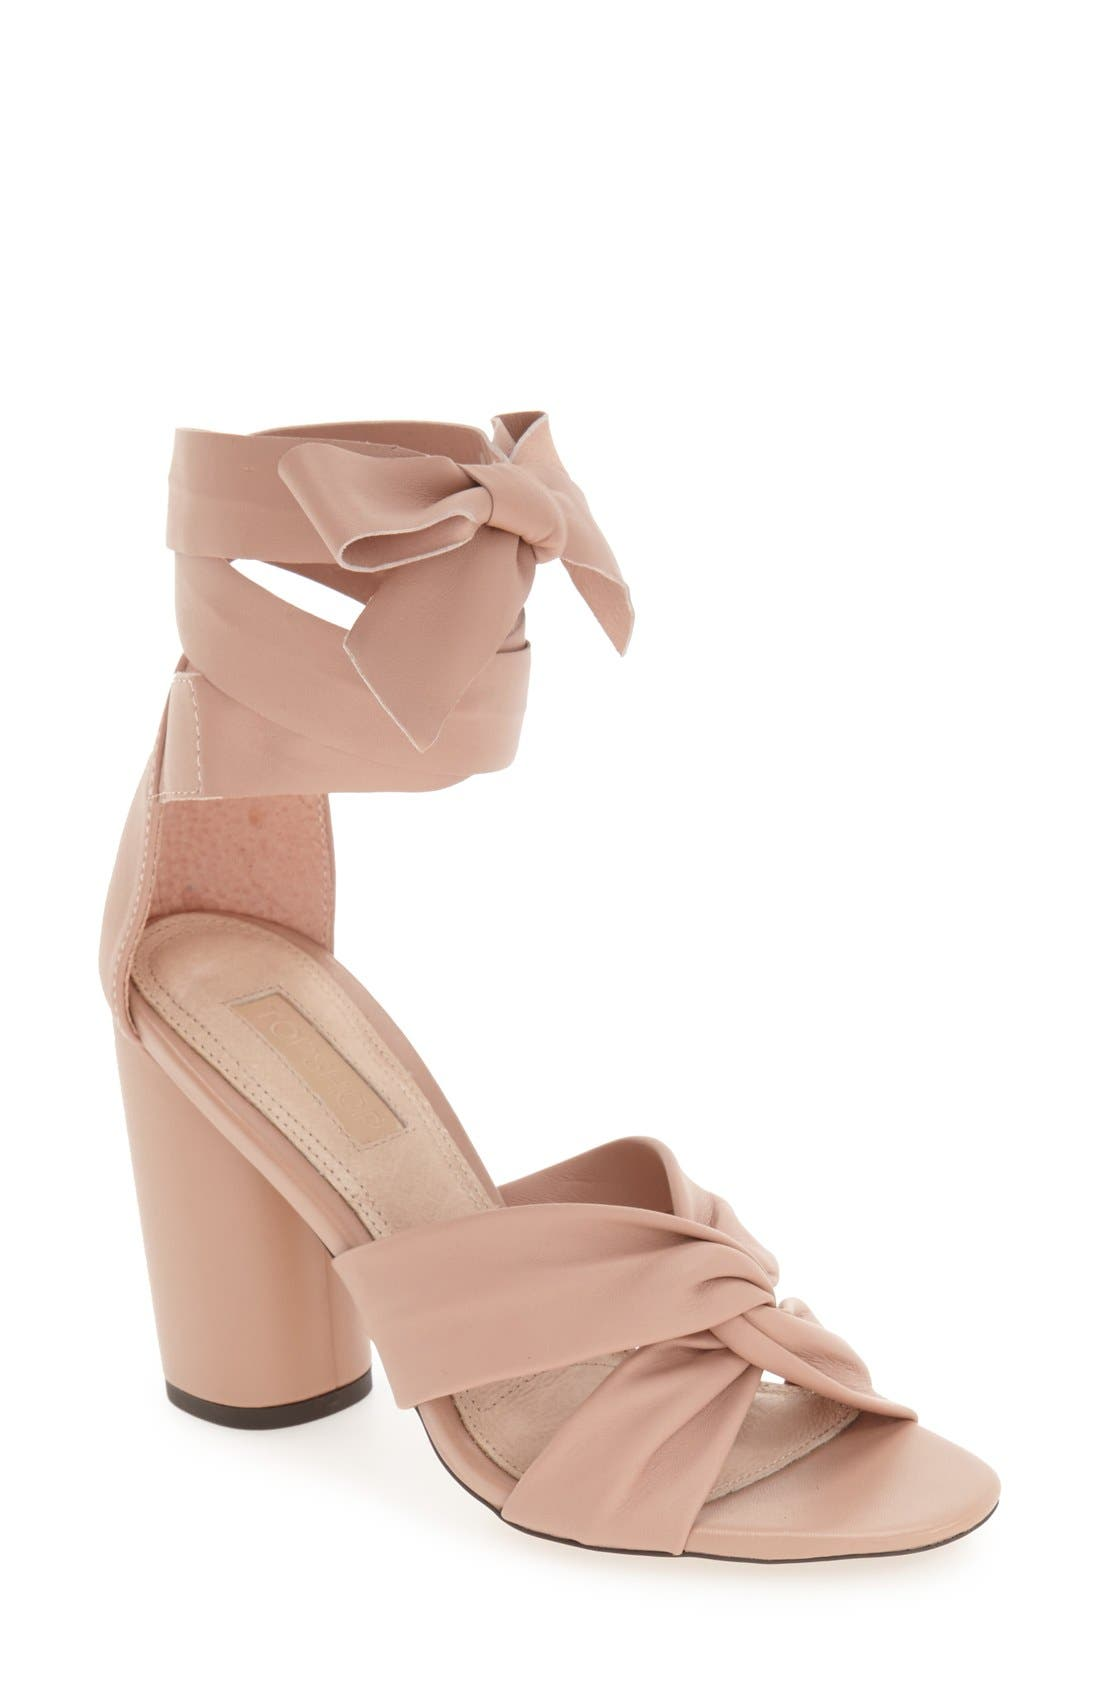 Alternate Image 1 Selected - Topshop 'Rosetta' Soft Knot Wraparound Sandal (Women)